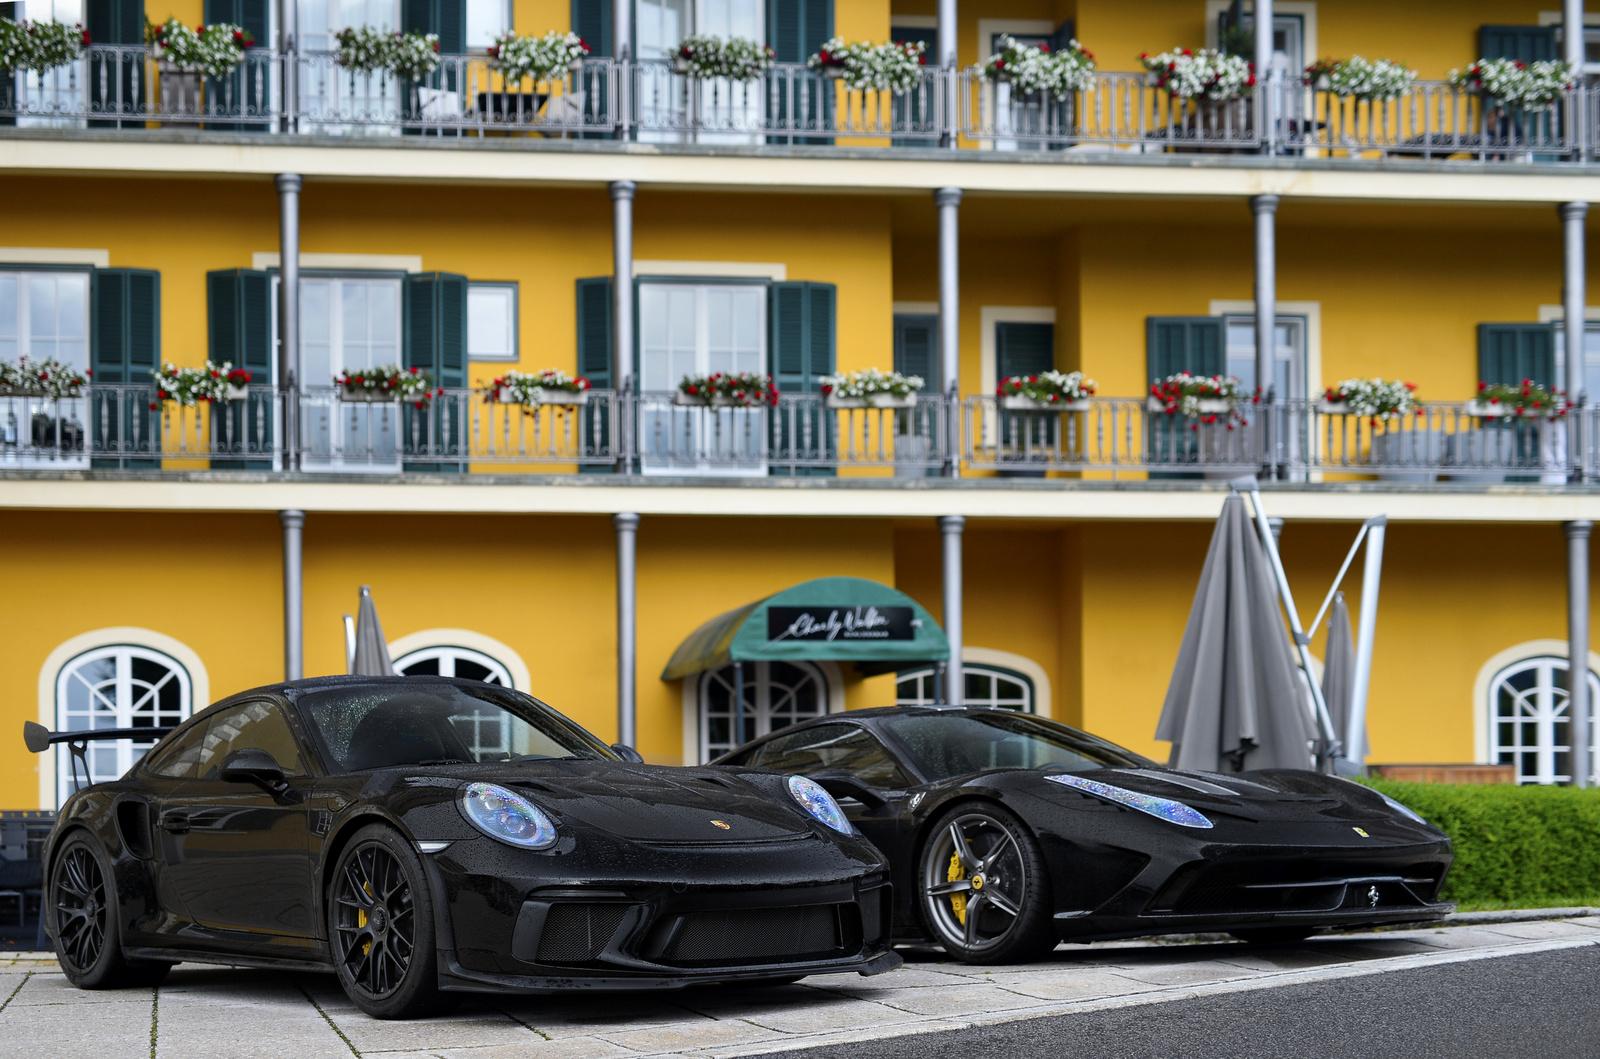 Porsche 911 GT3 RS MKII - Ferrari 458 Speciale